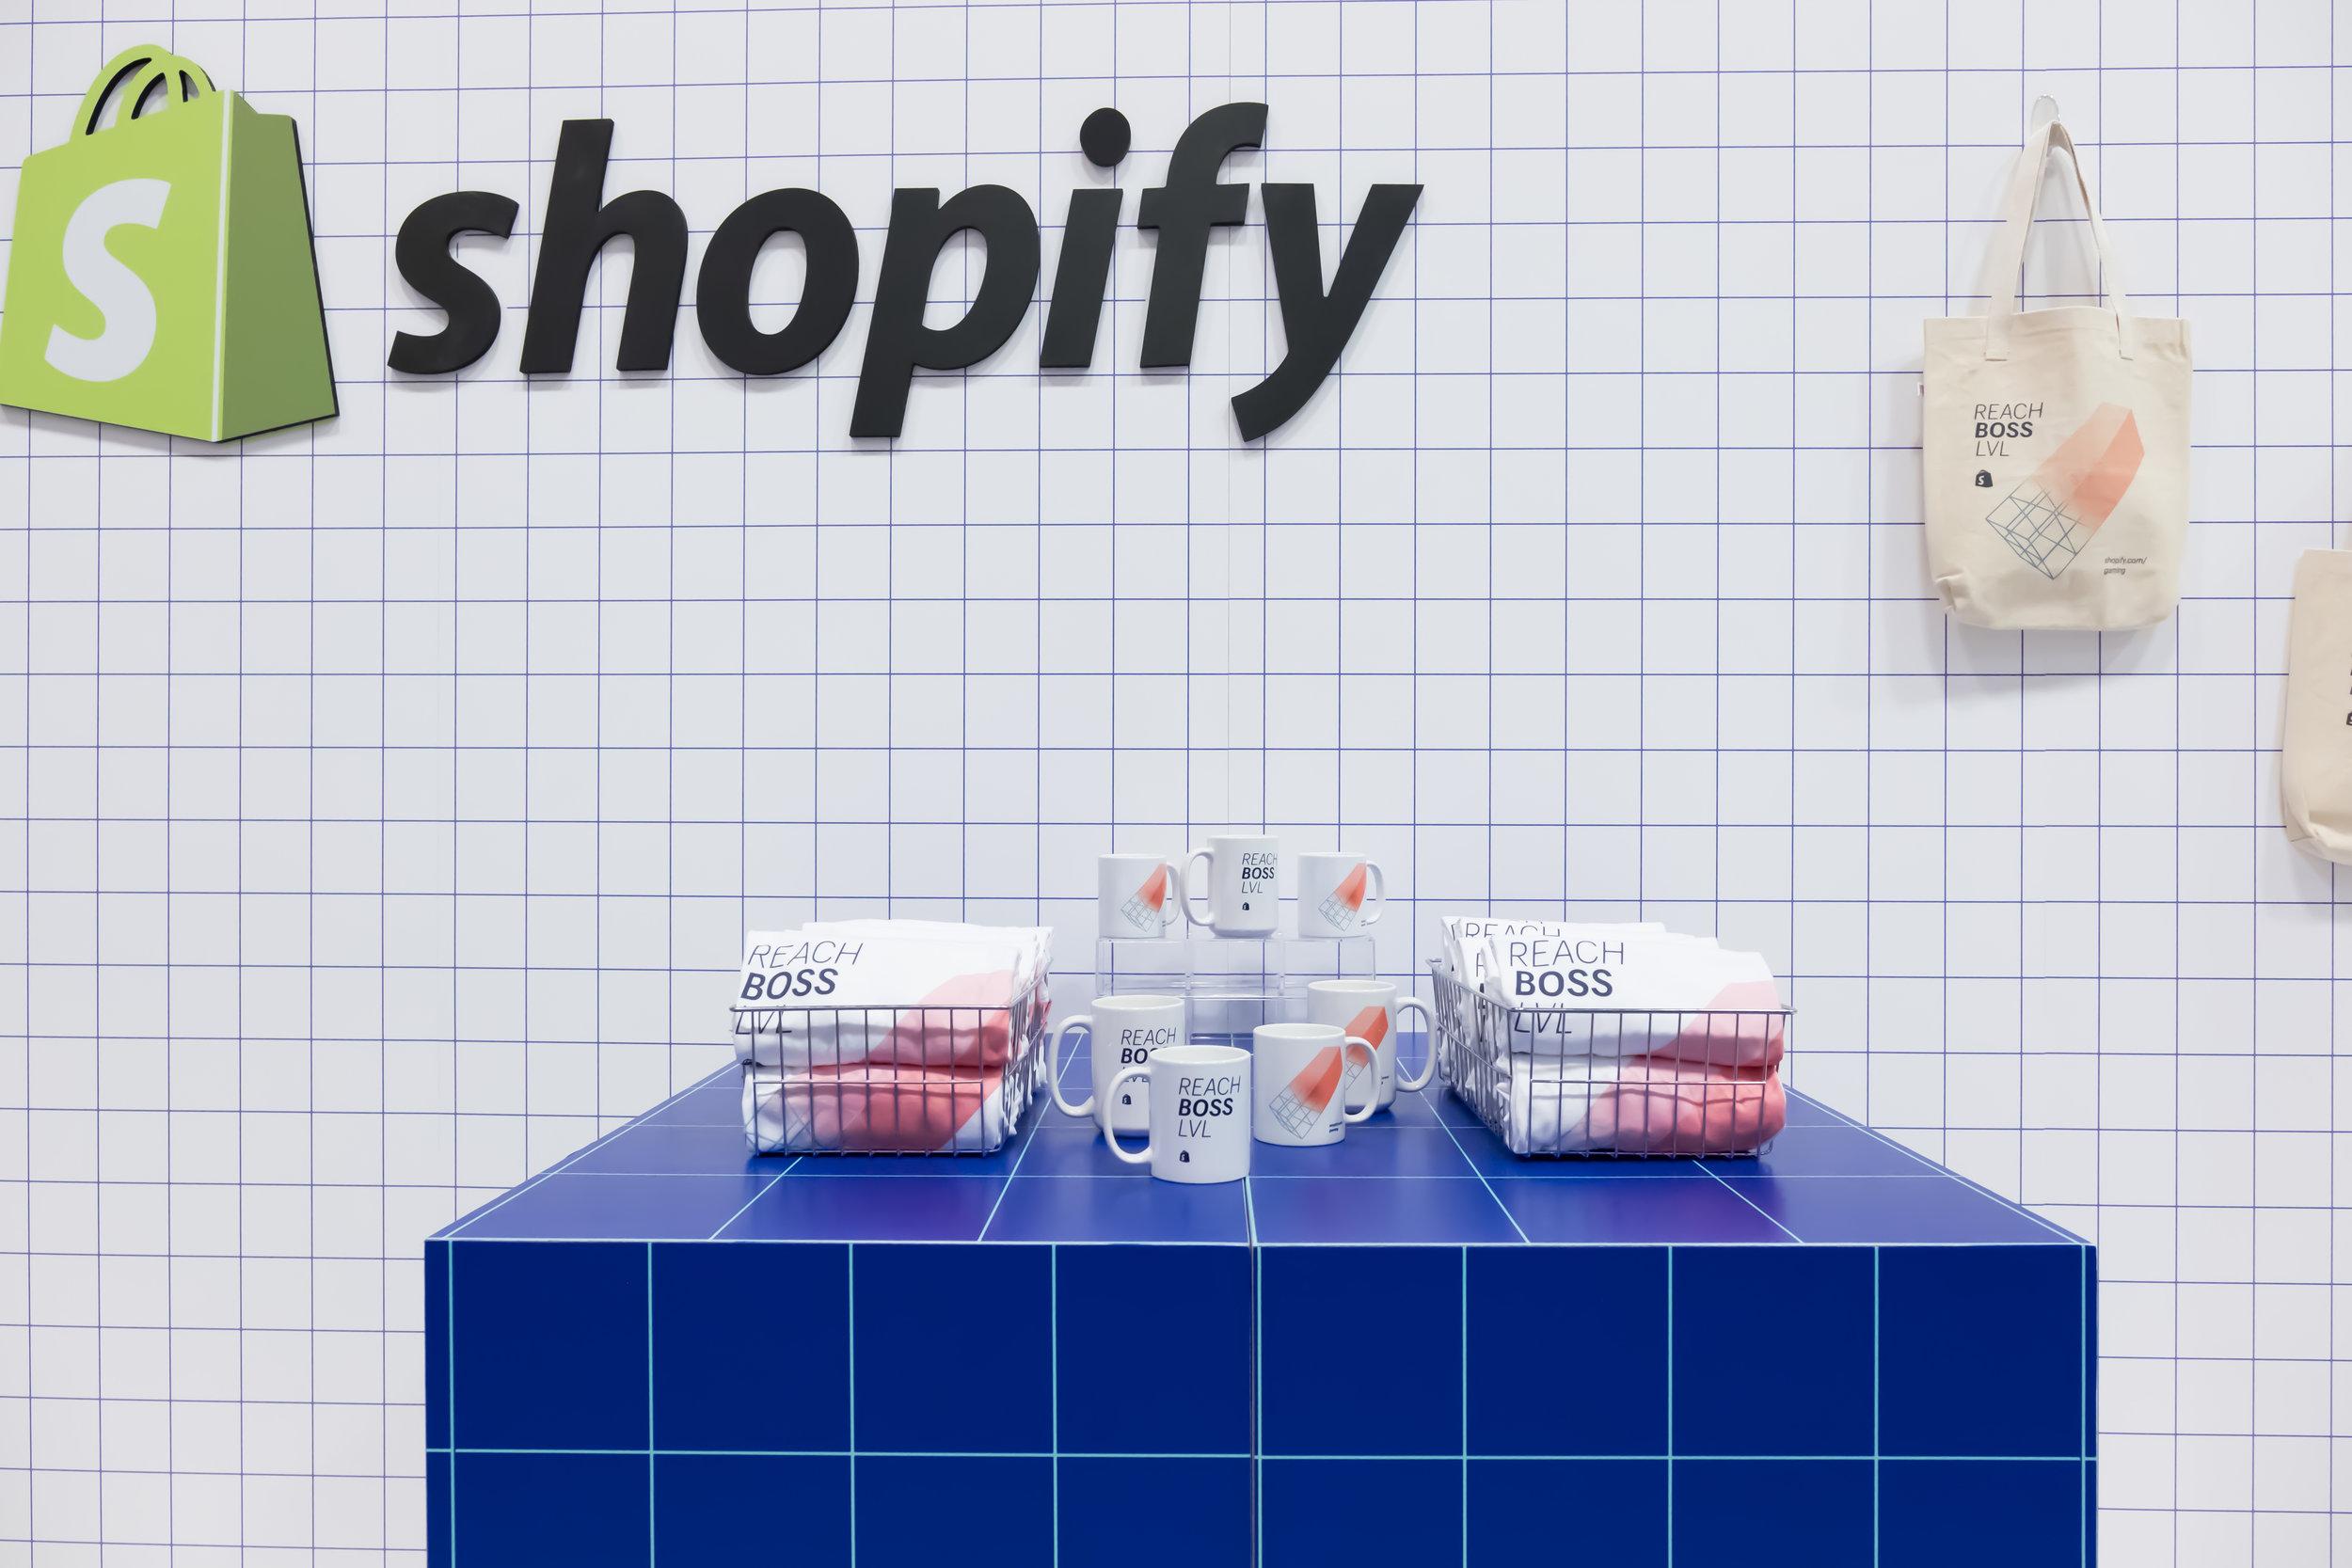 shopifyGDC18-8.jpg